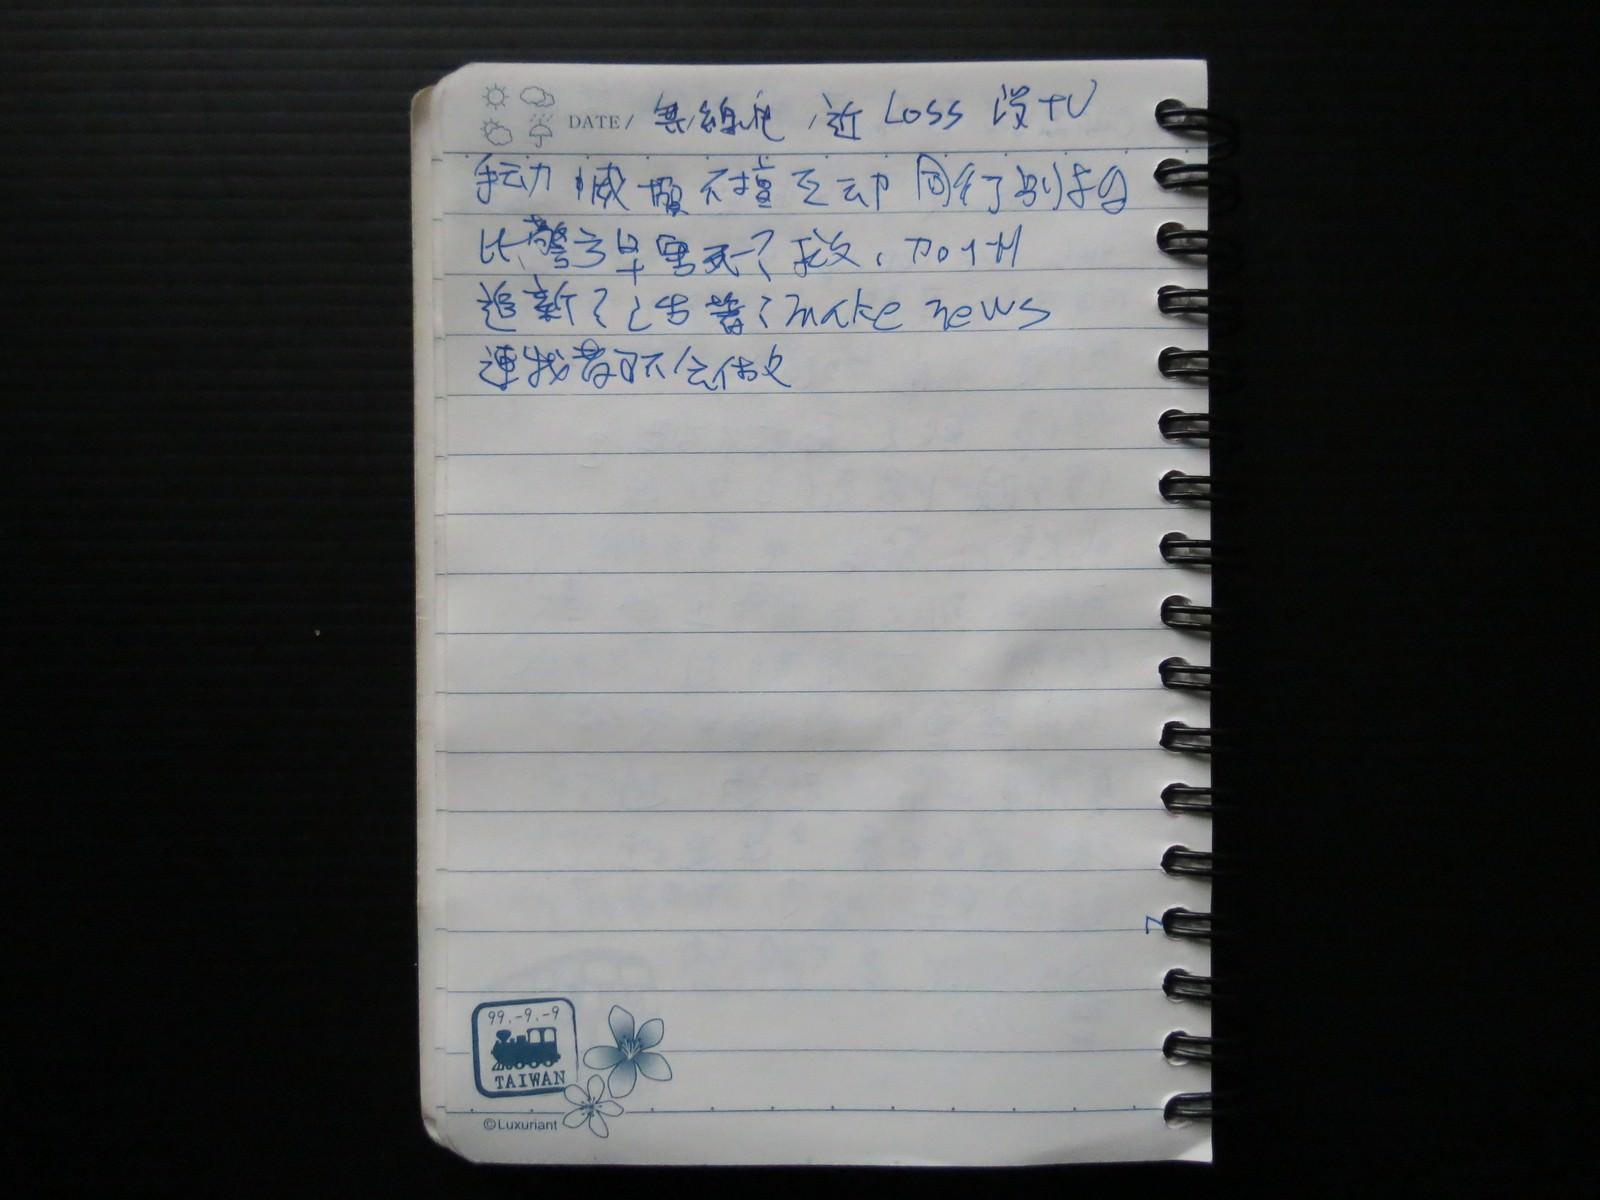 Movie, Nightcrawler(美國, 2014年) / 獨家腥聞(台灣) / 頭條殺機(香港) / 夜行者(網路), 電影海報, 心得速記